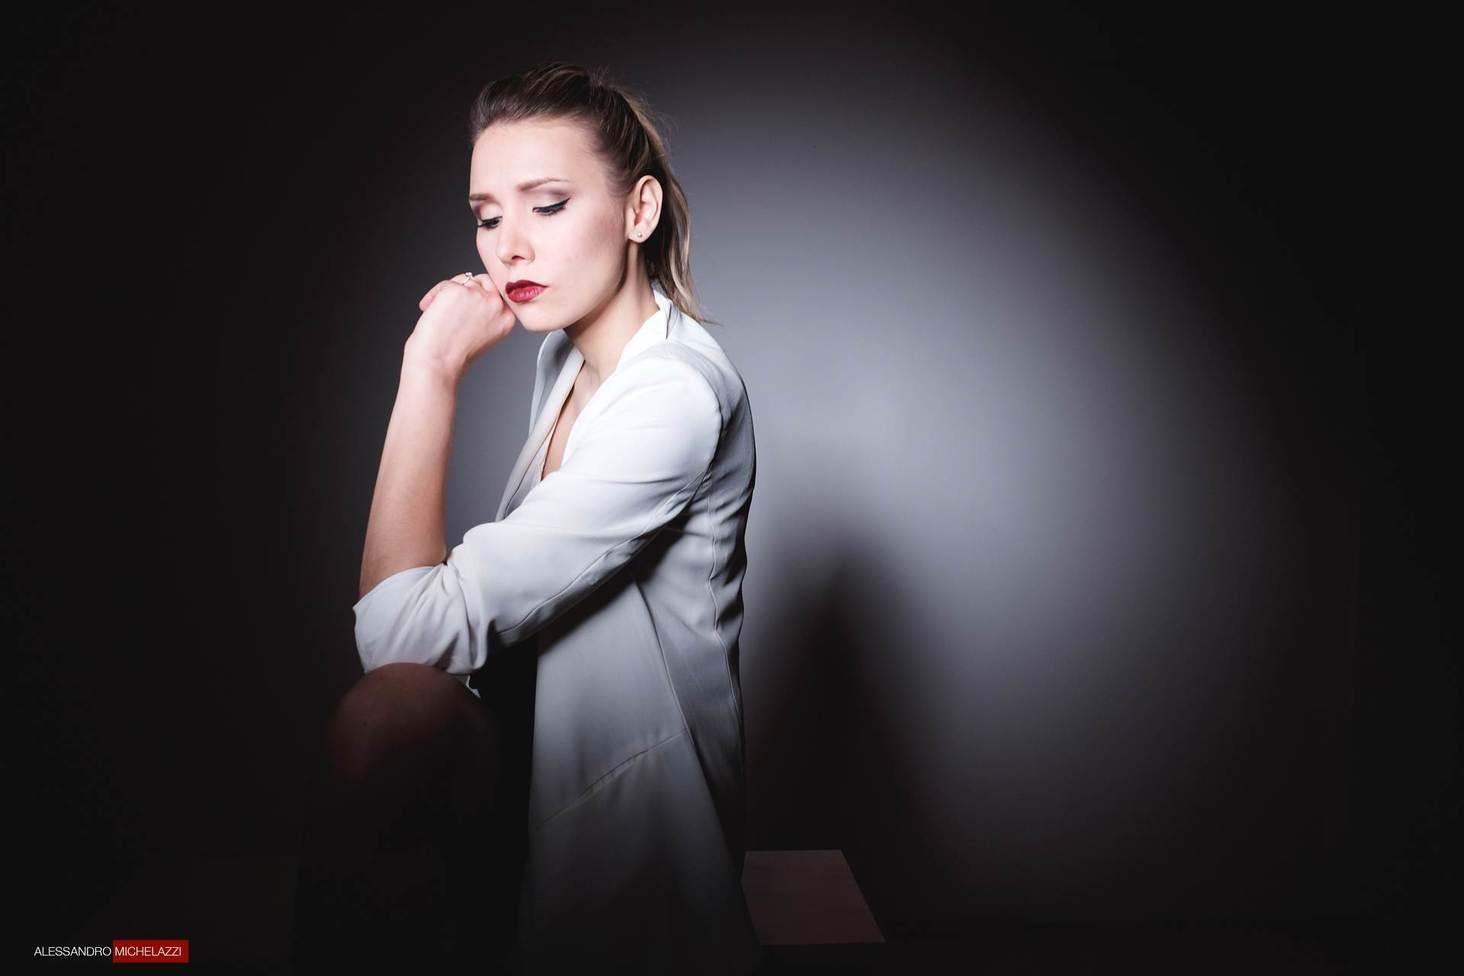 Alessandro-Michelazzi-Photography-X70-Fashion-Test-5